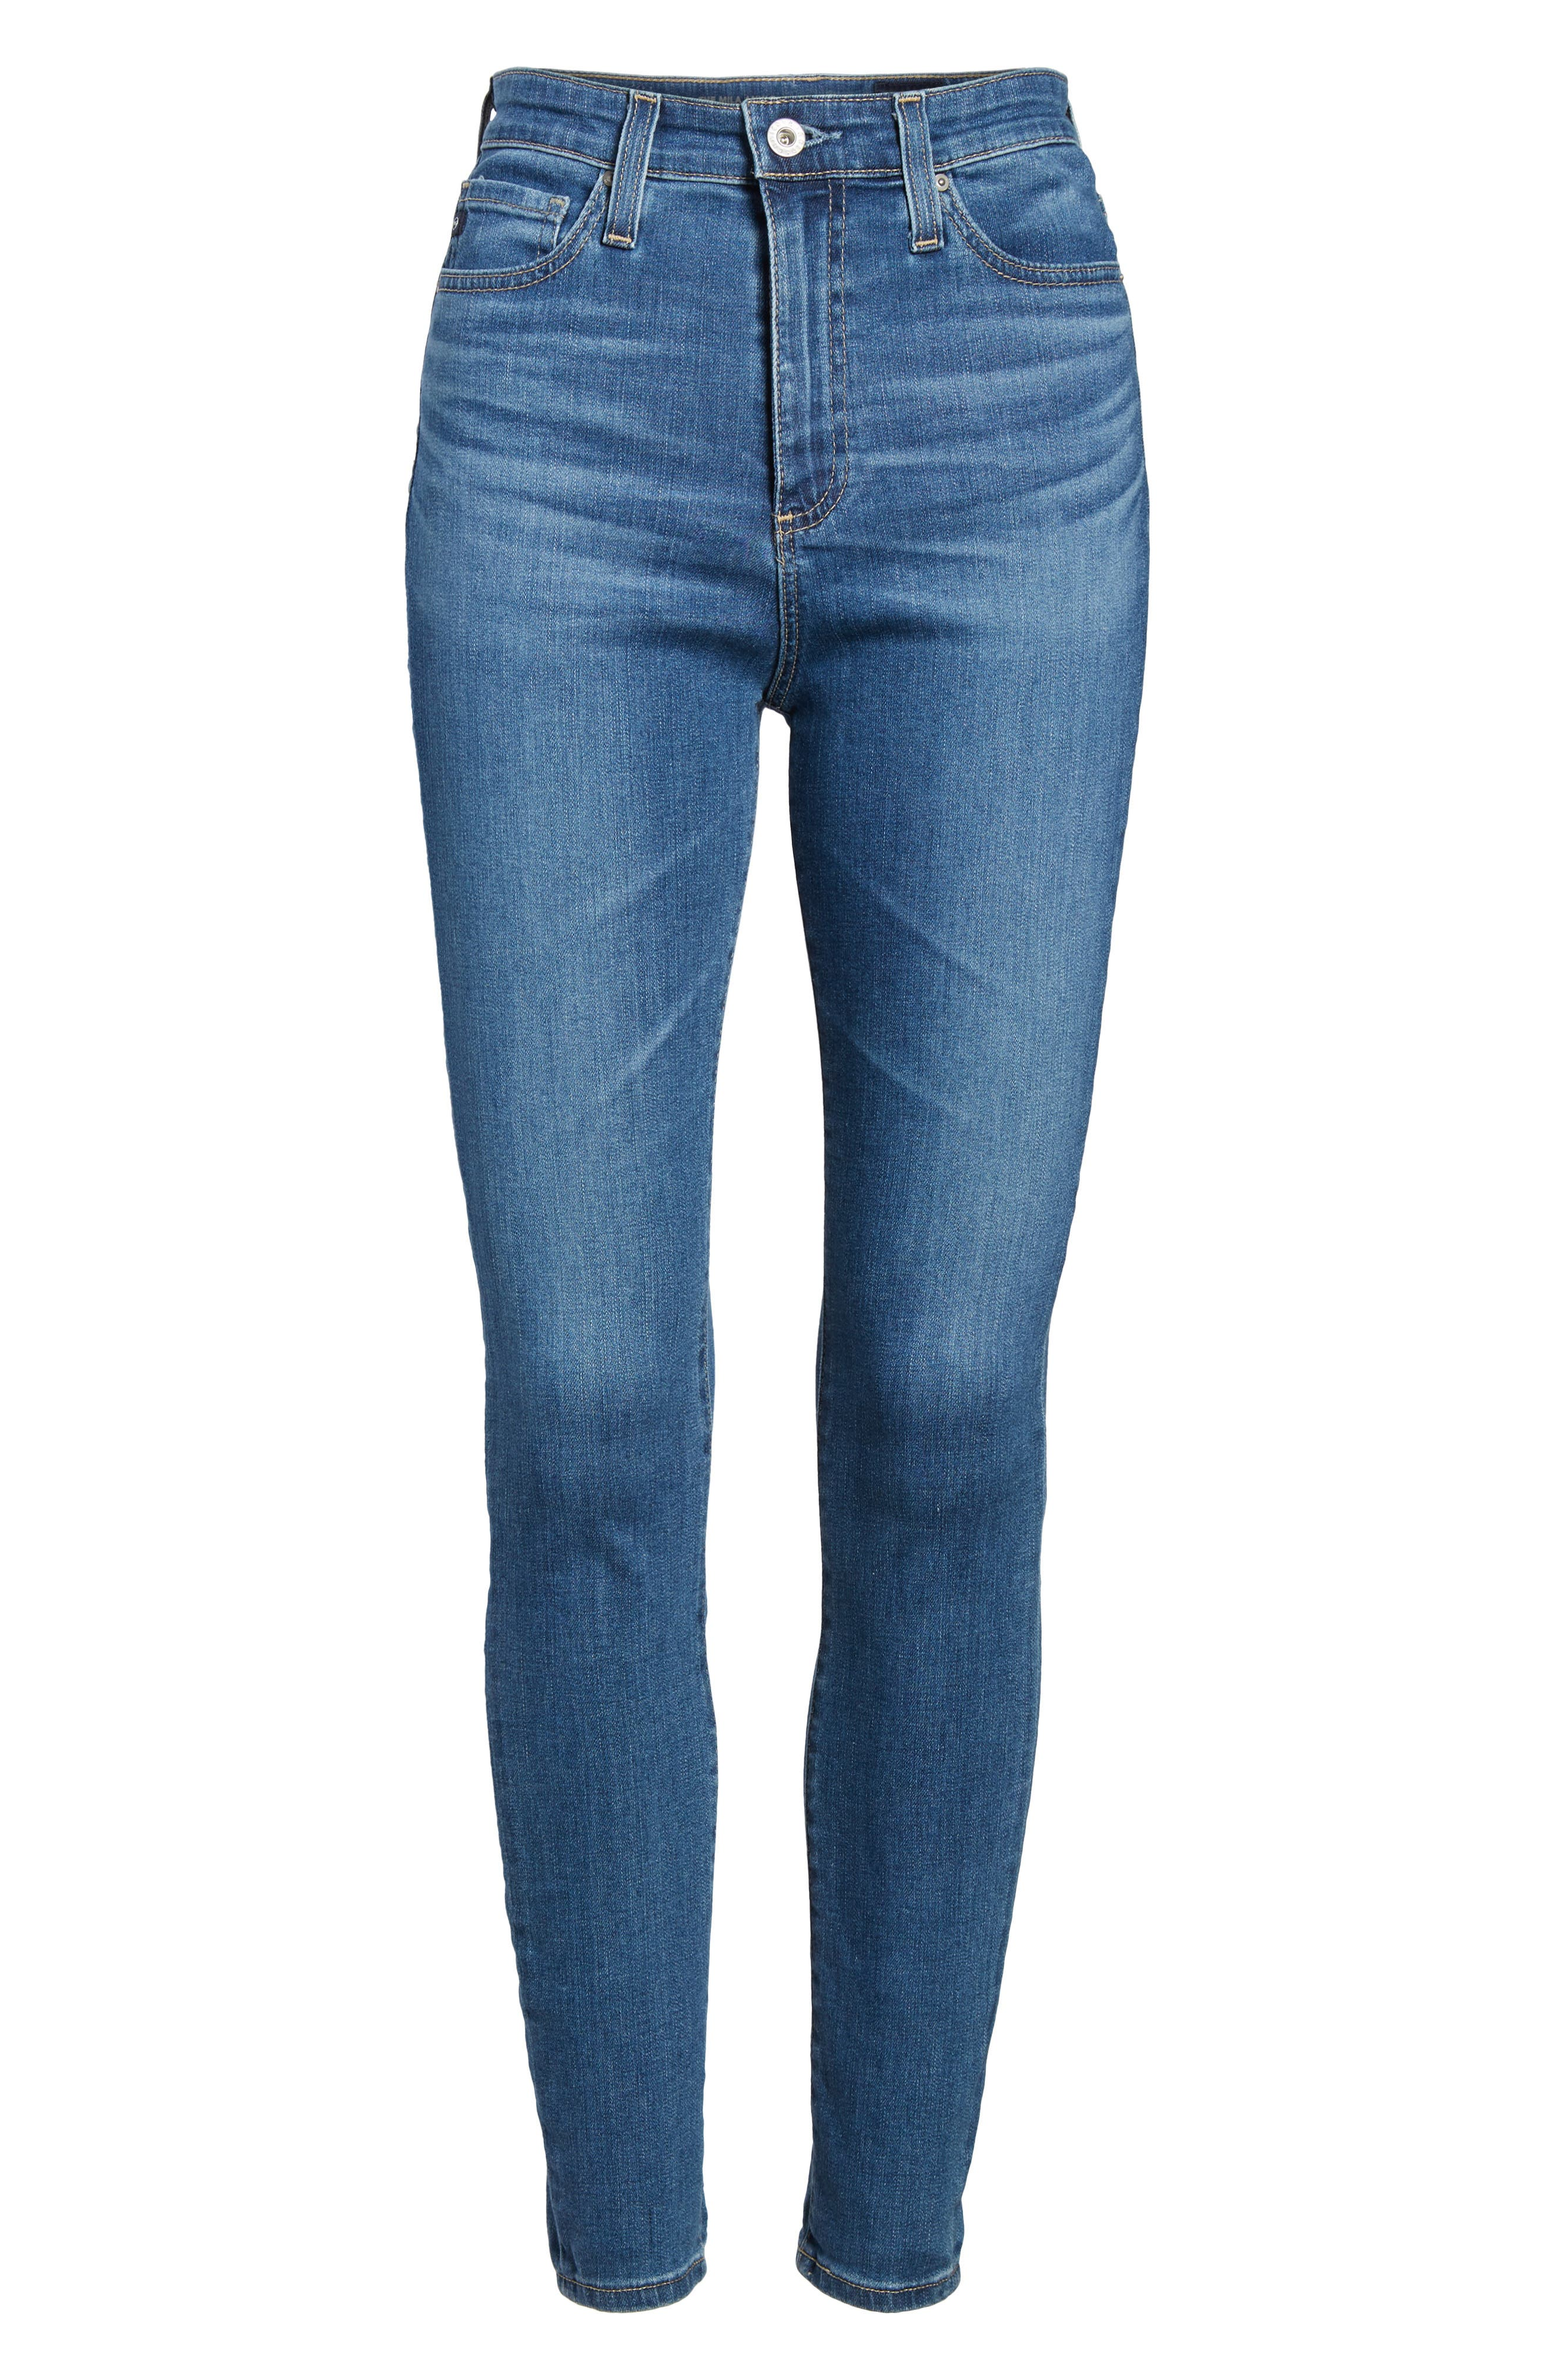 Mila High Waist Ankle Skinny Jeans,                             Alternate thumbnail 7, color,                             416